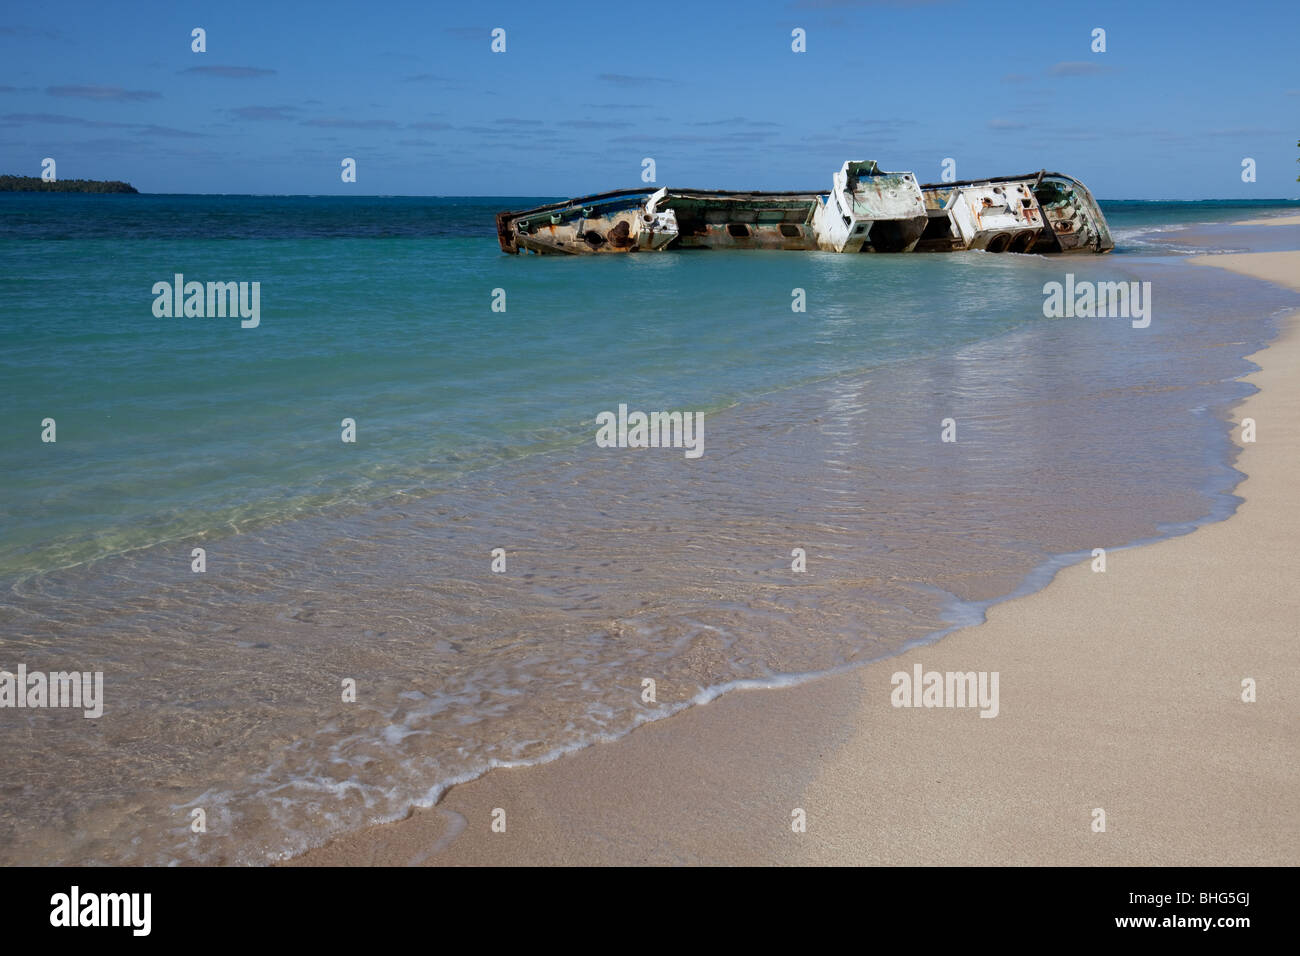 Shipwreck on remote island. - Stock Image